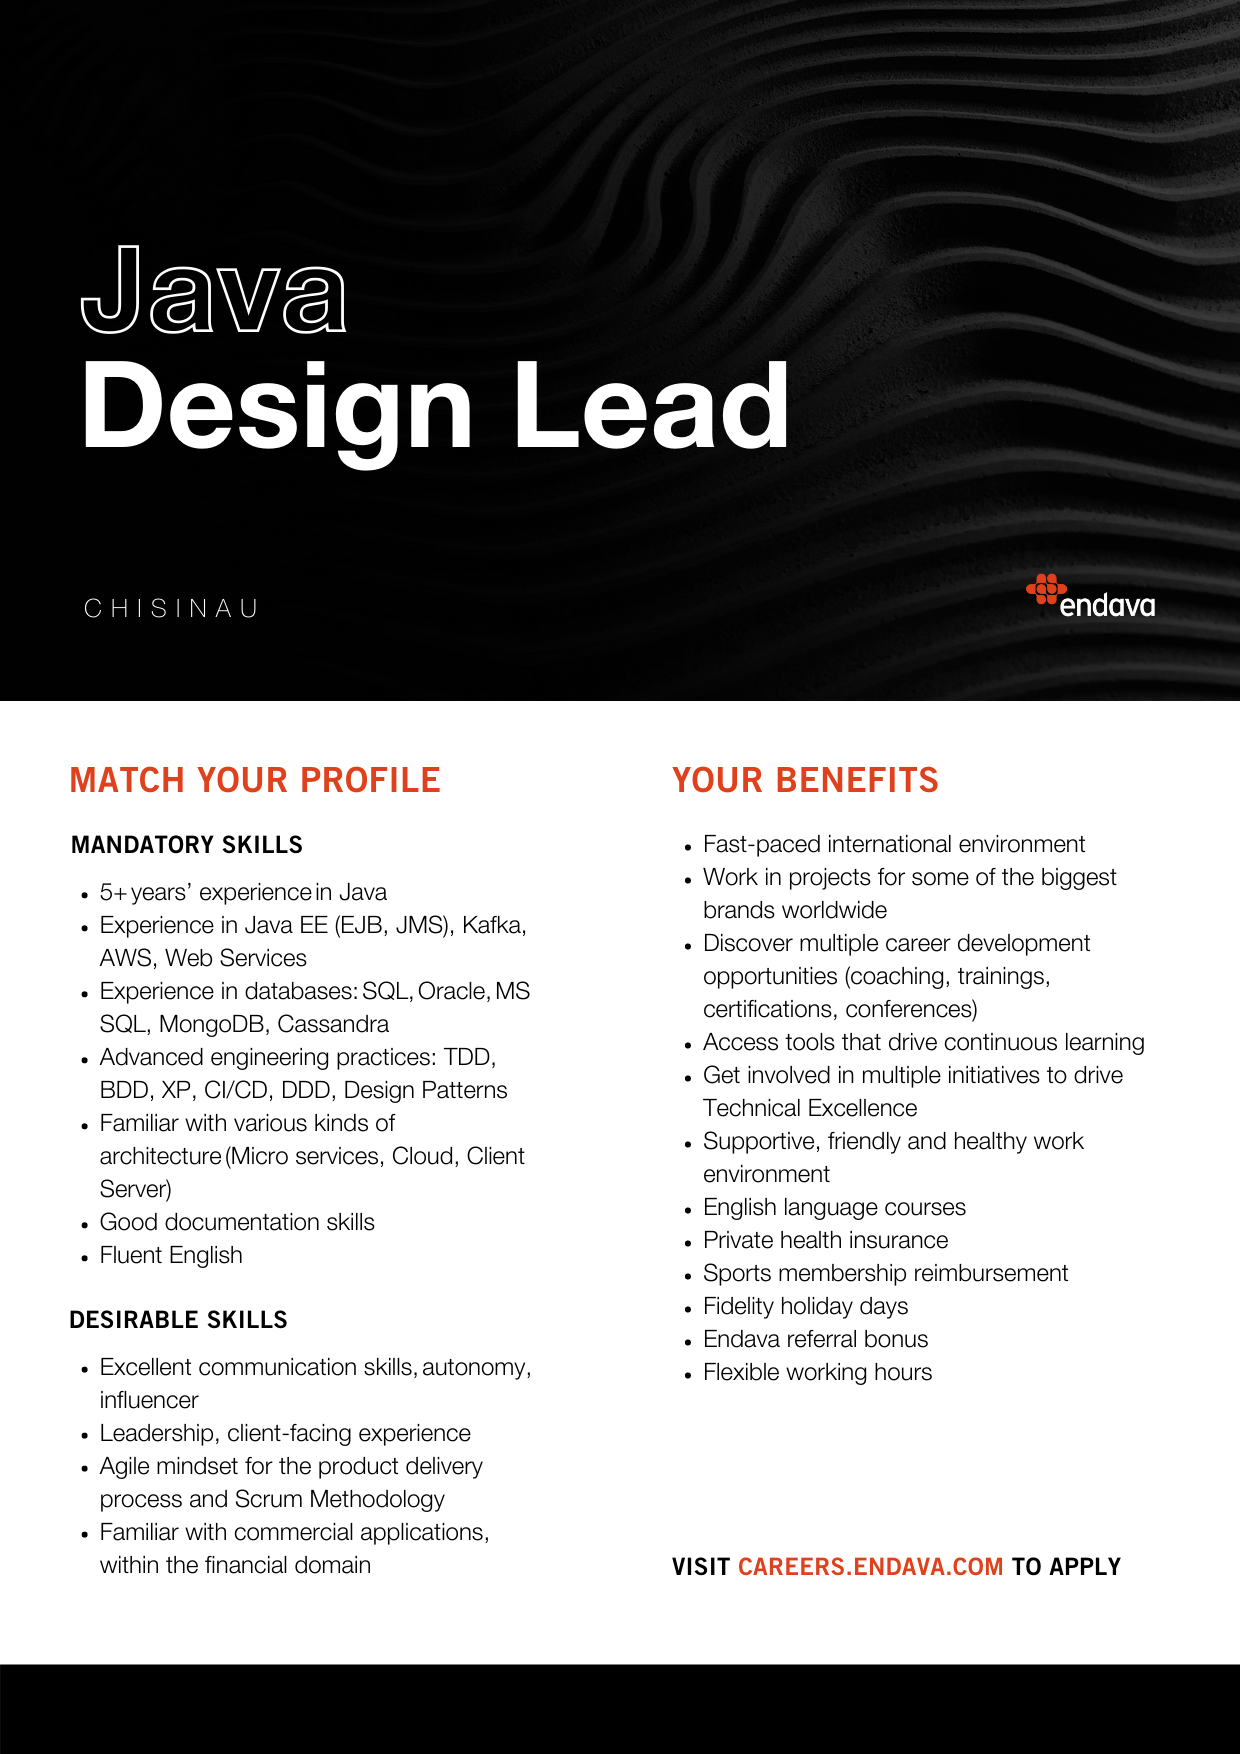 Java Design Lead at Endava